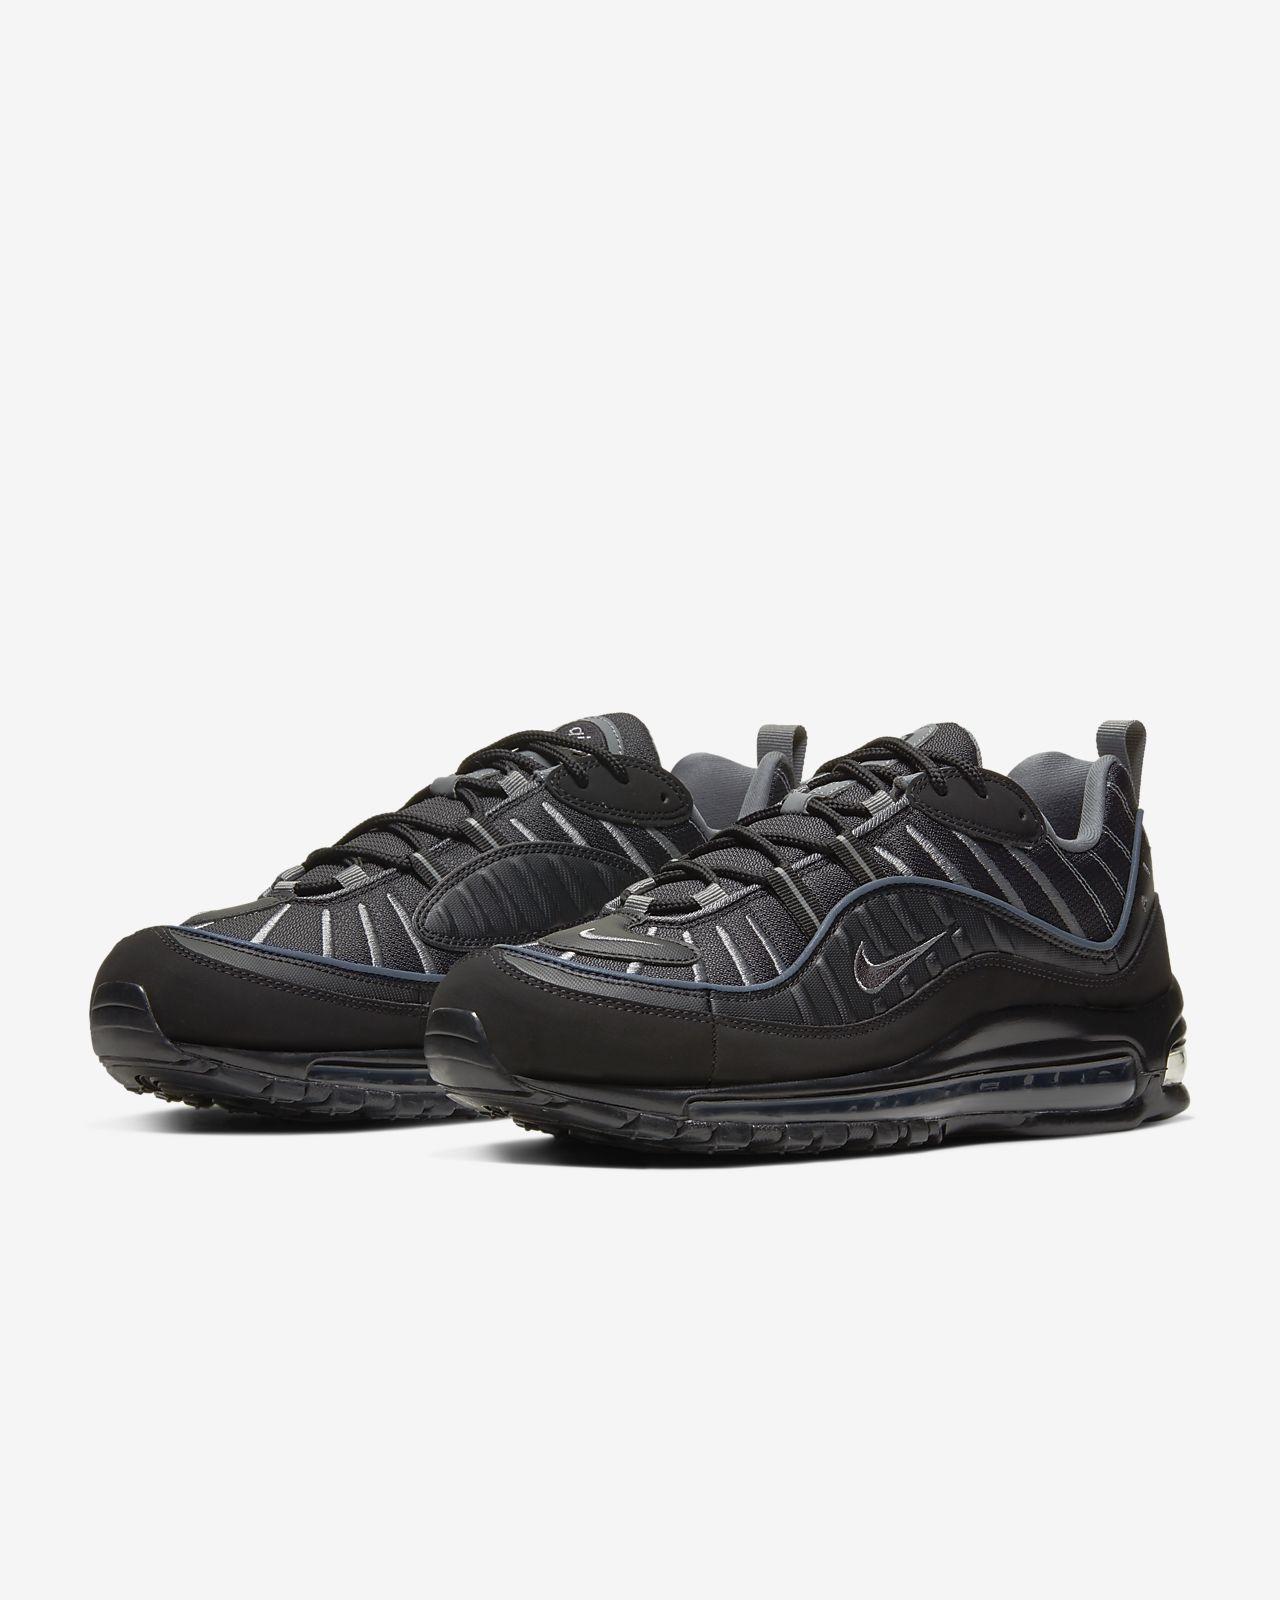 Chaussure Nike Air Max 98 pour Homme